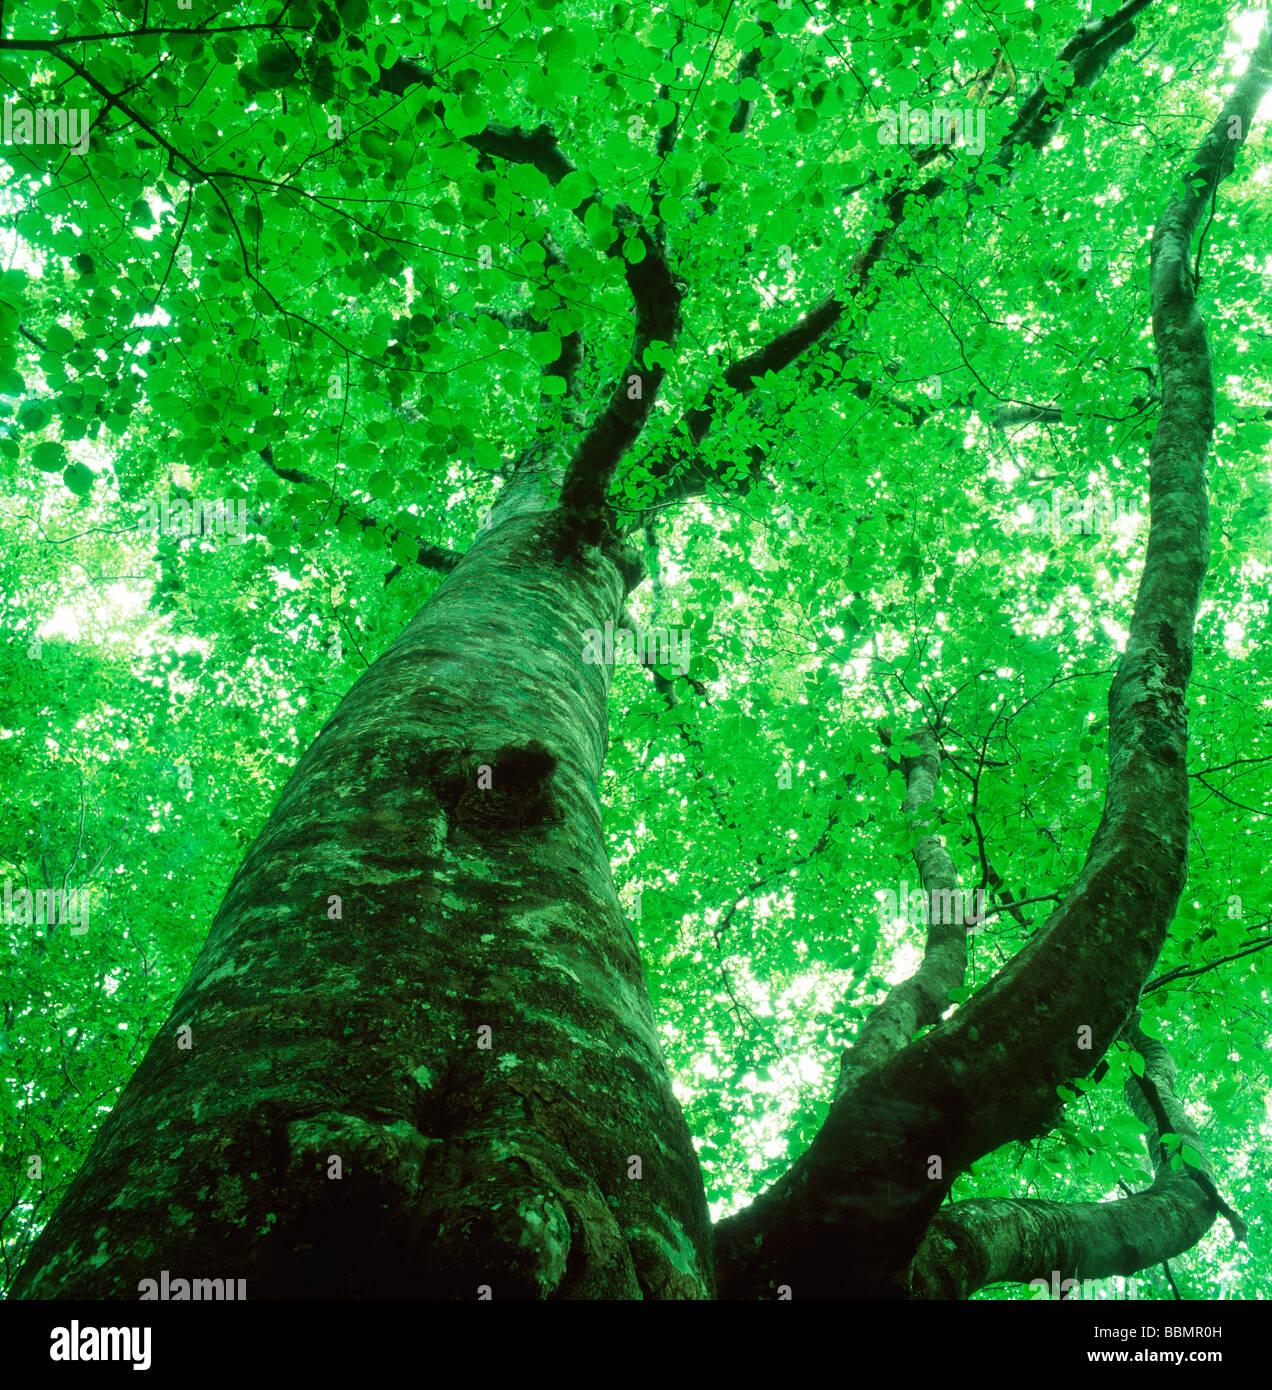 Upward view of a tree - Stock Image